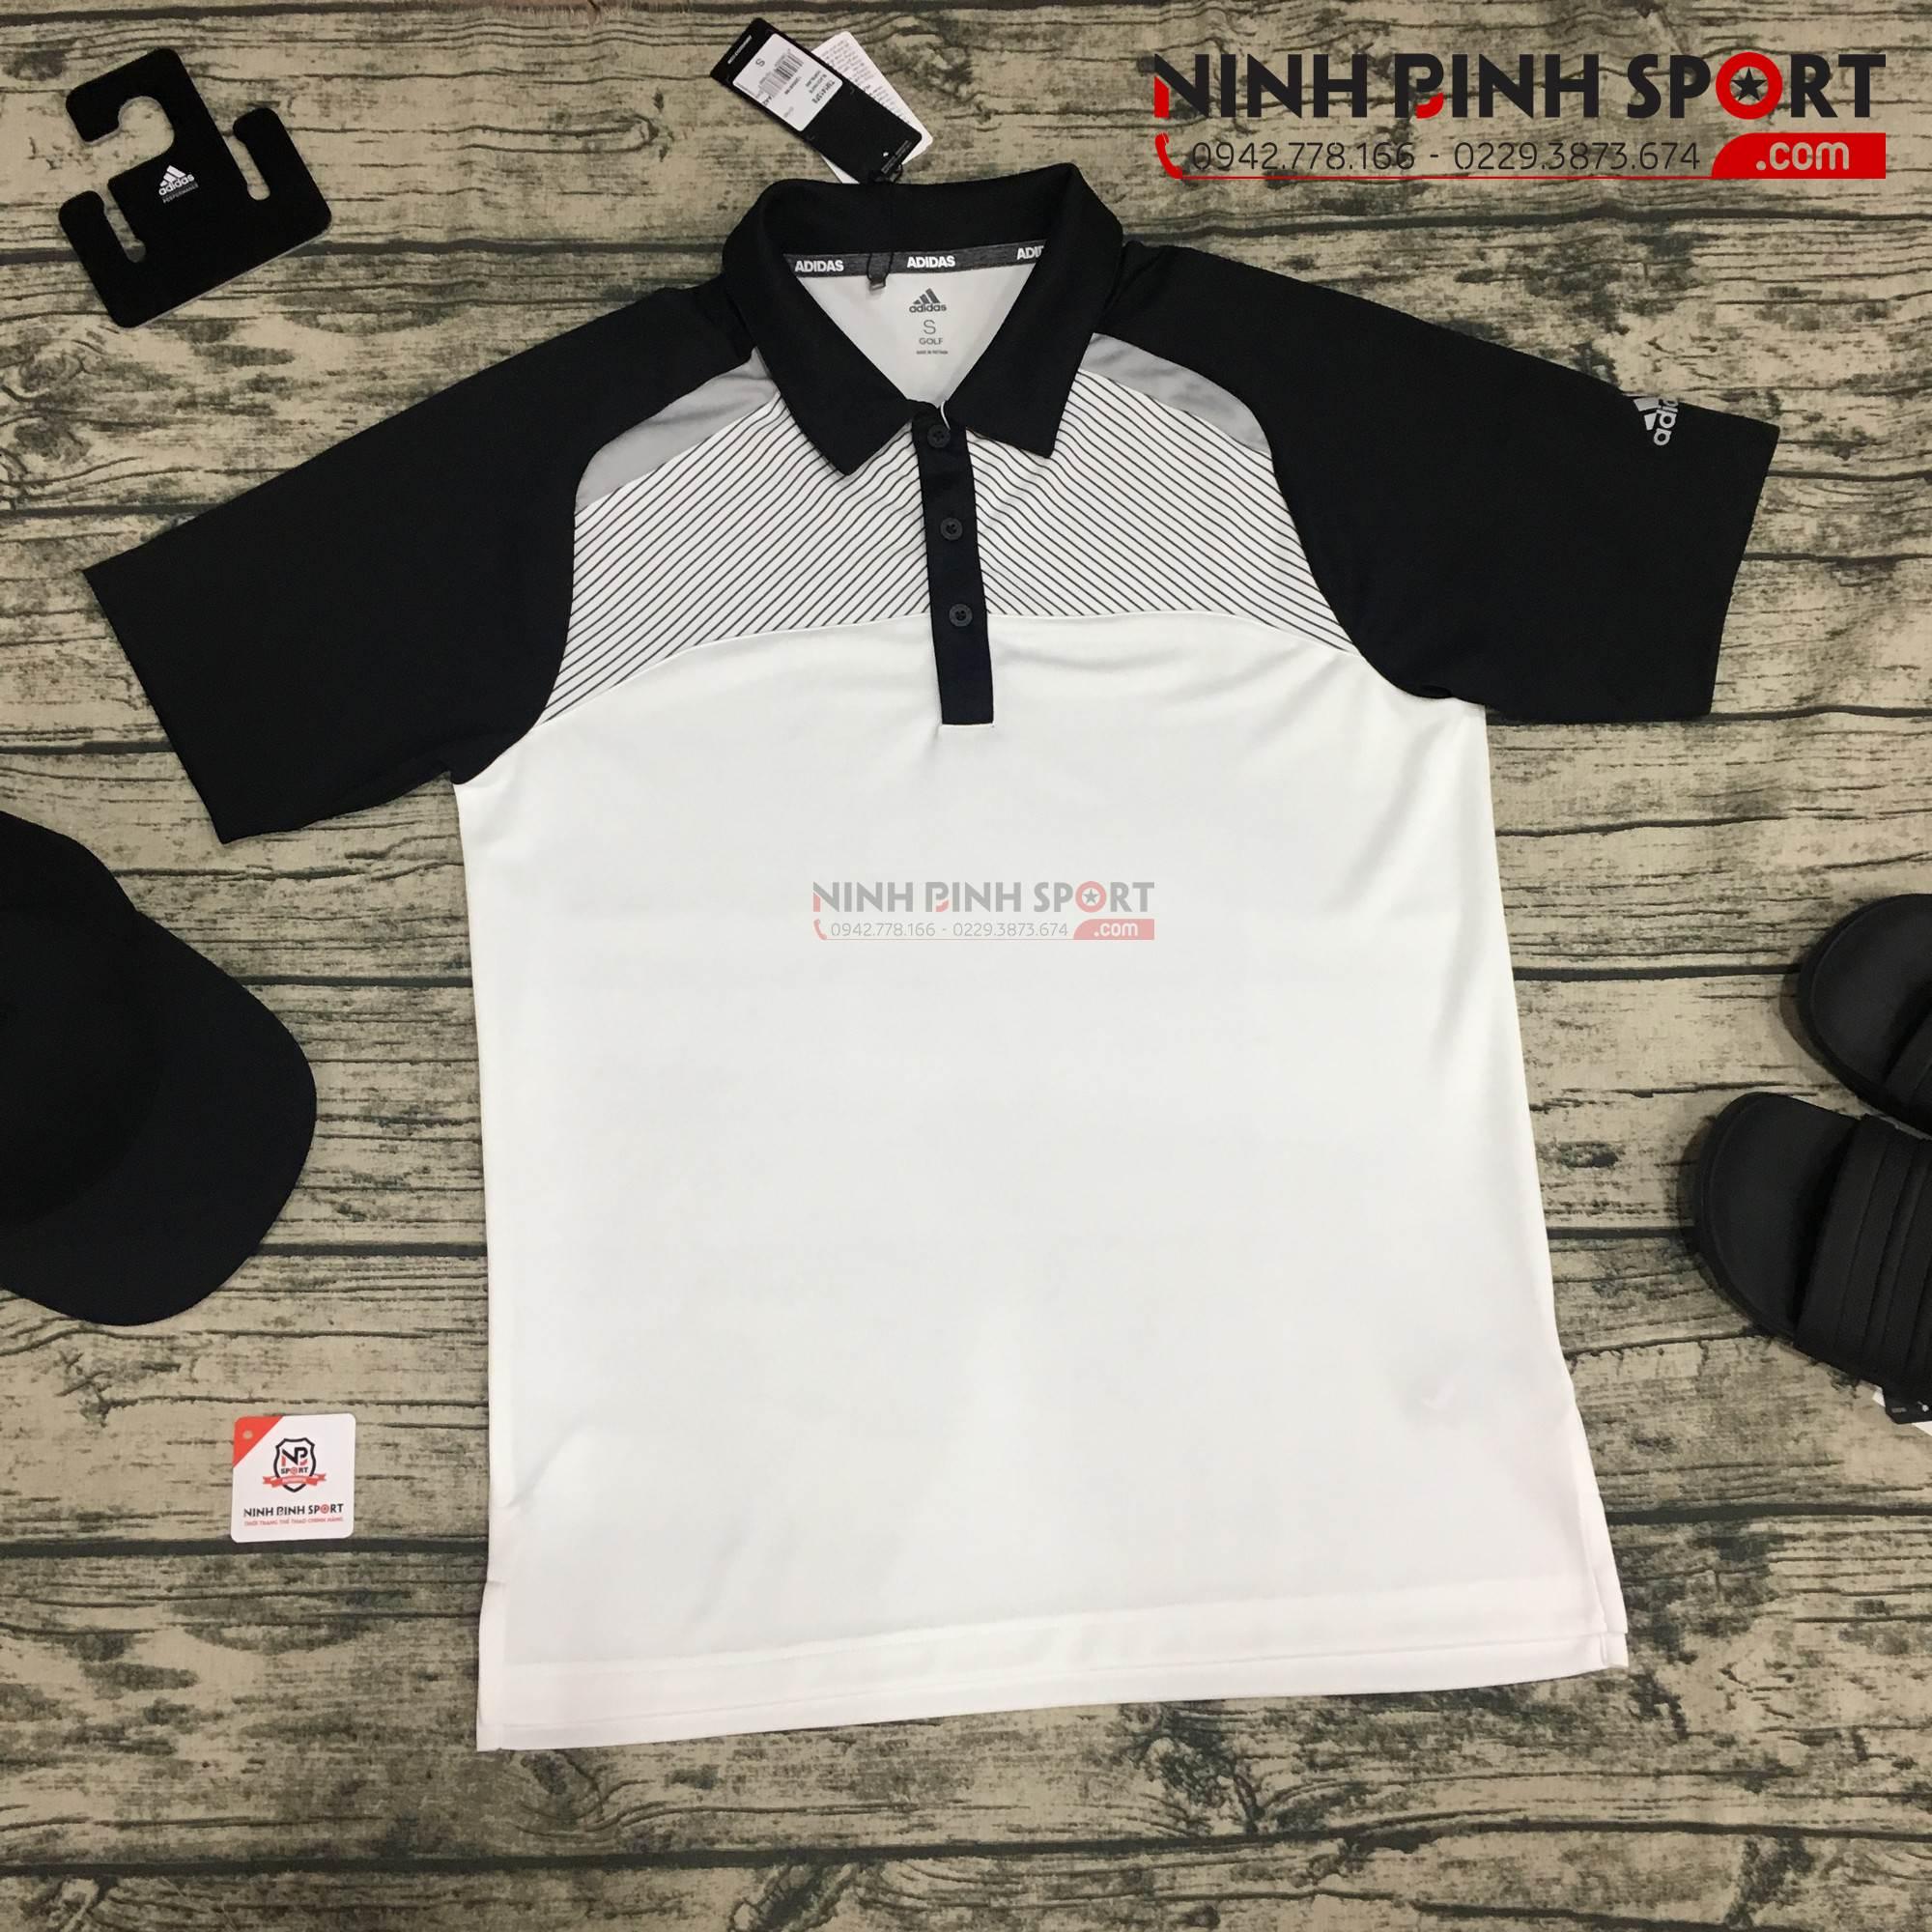 Áo thể thao golf nam Adidas Performance CY7407